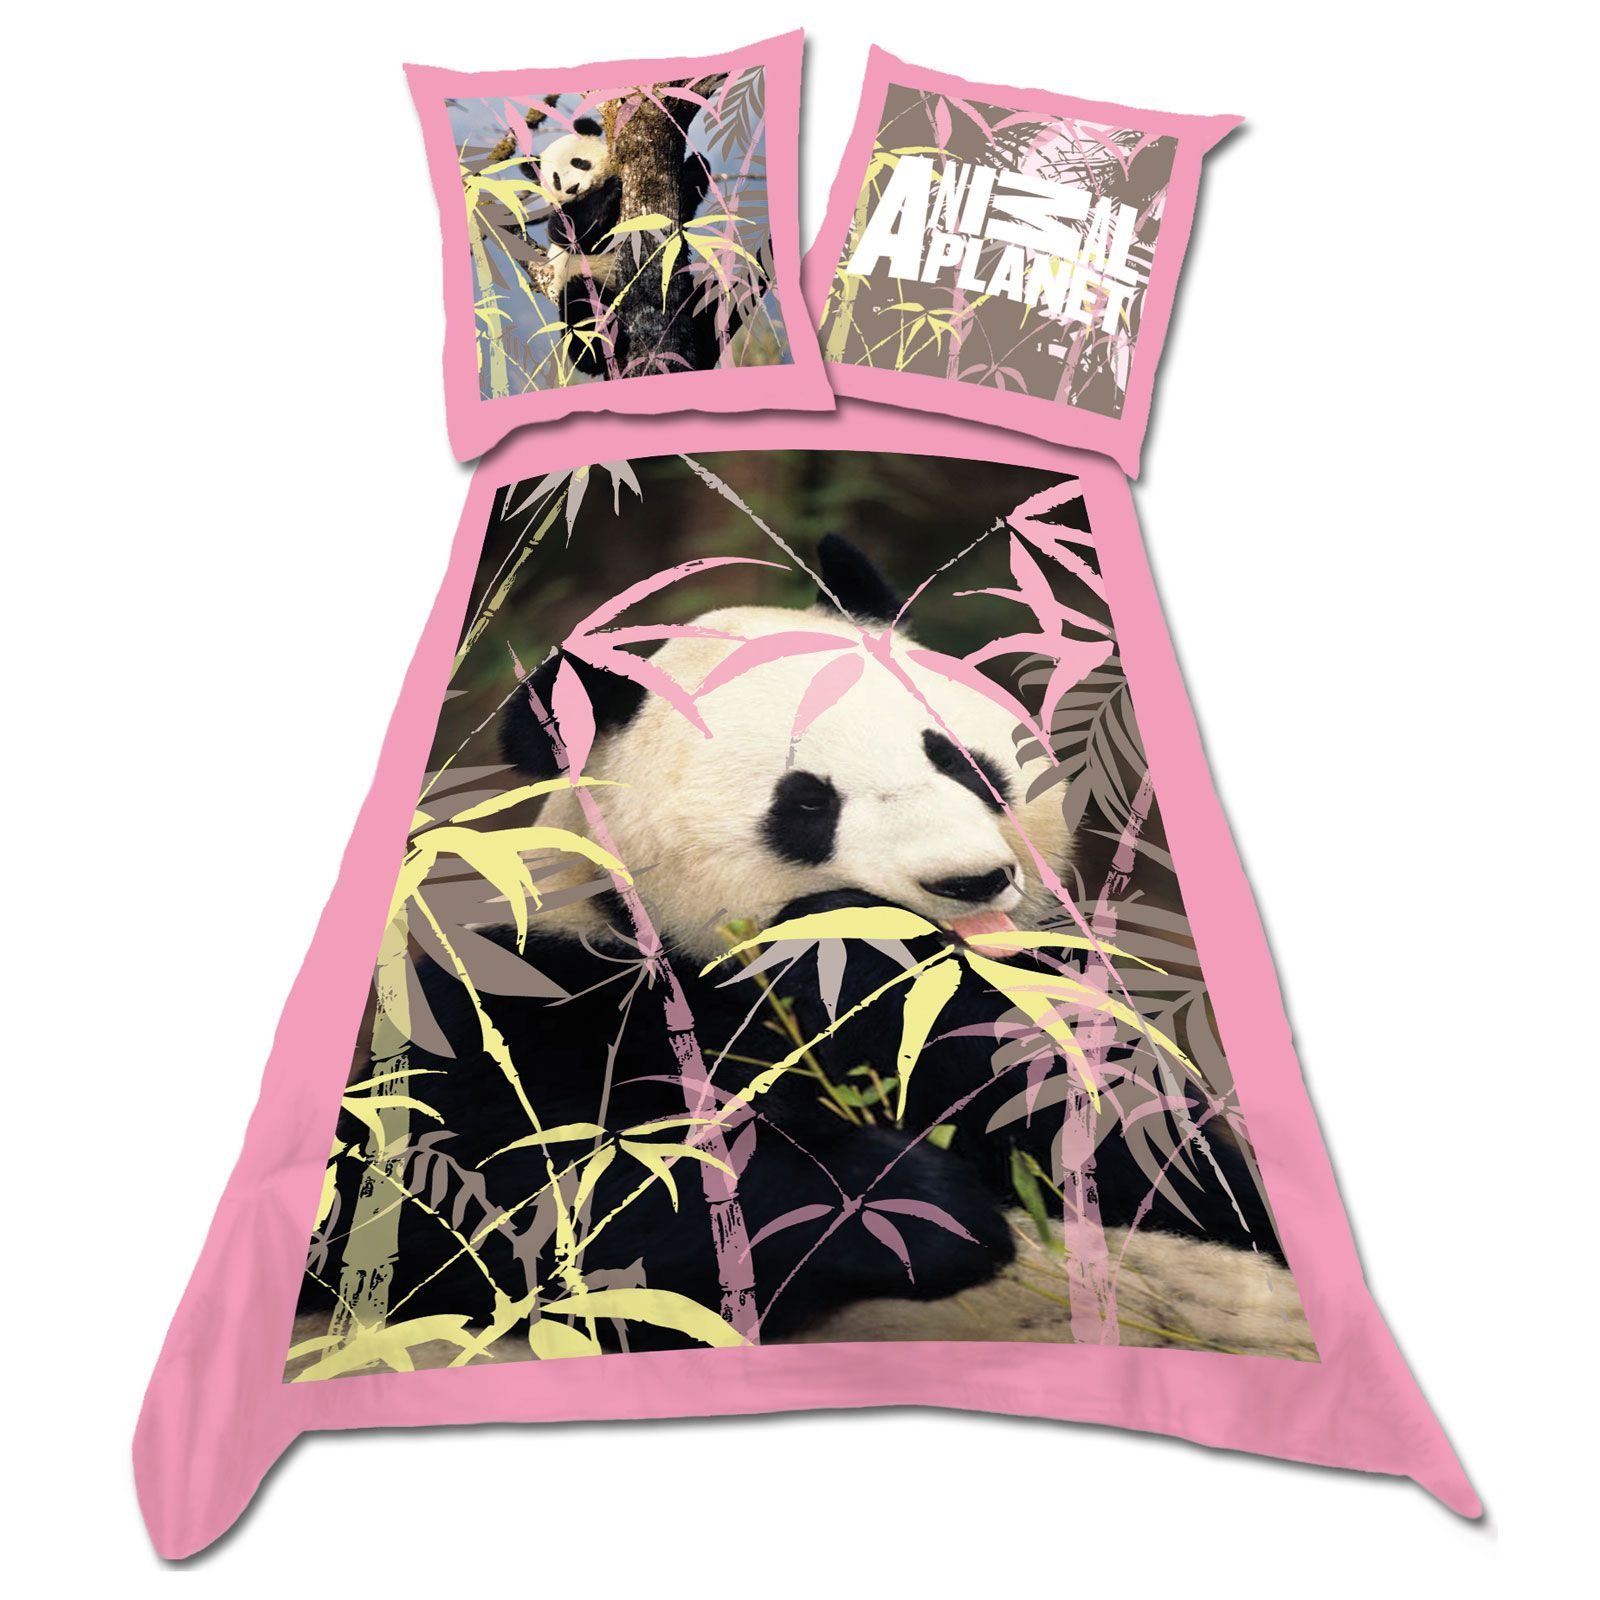 ANIMAL PLANET 'PANDA BEAR' SINGLE DUVET COVER 100% COTTON